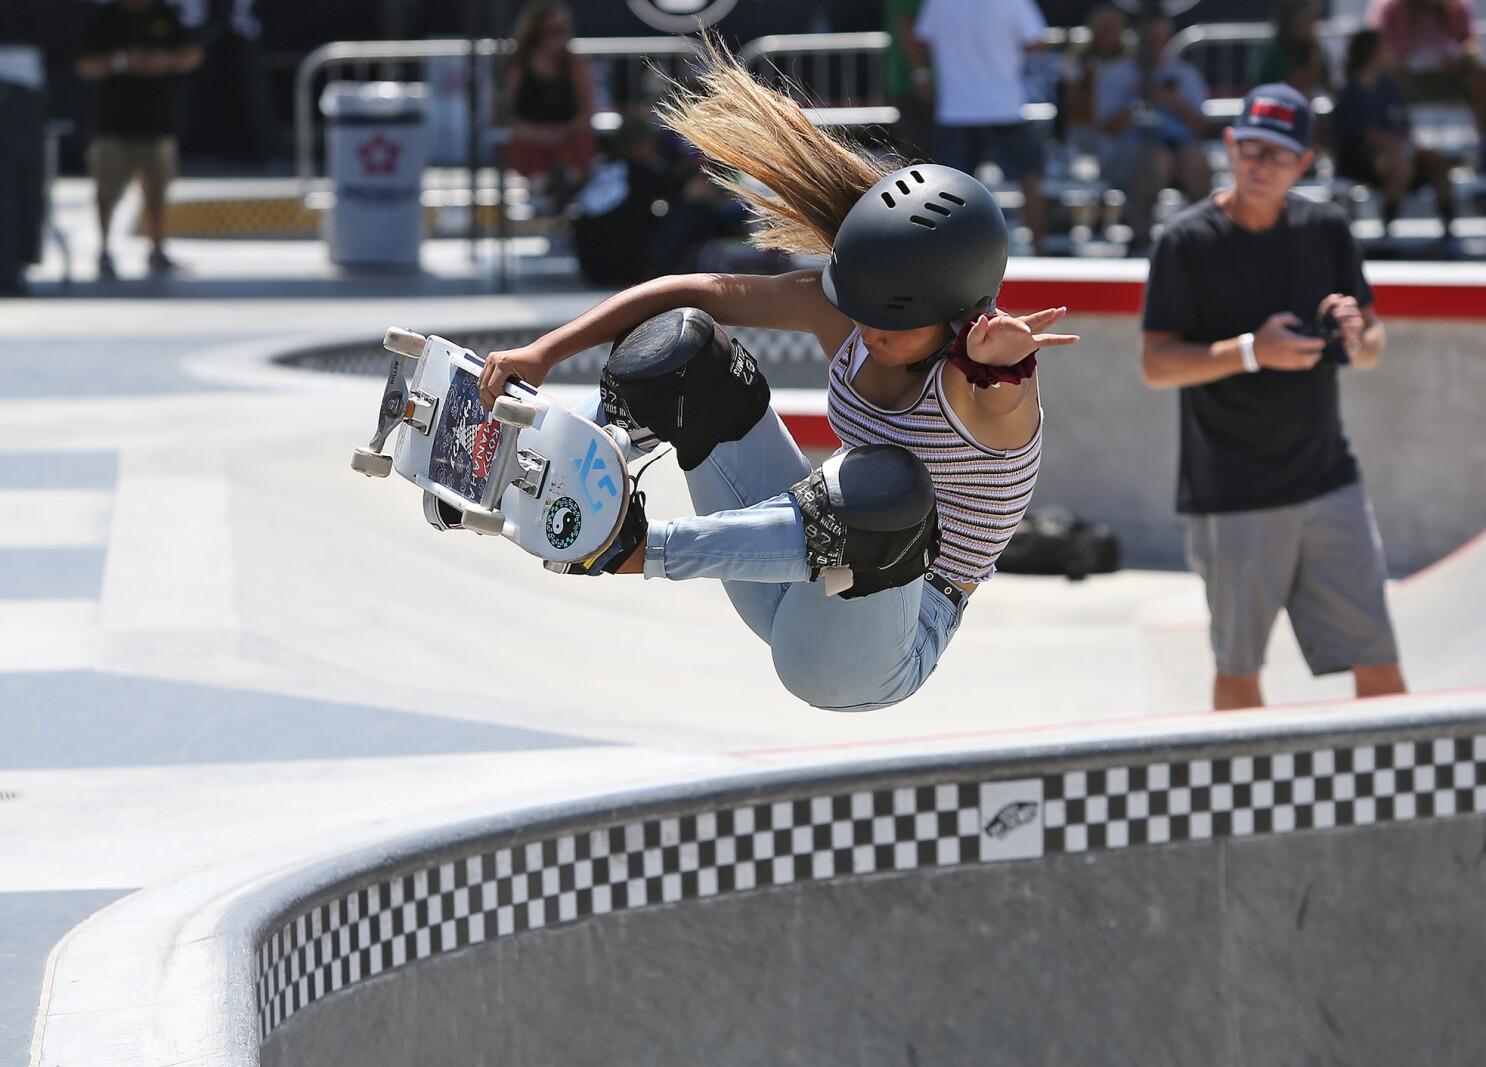 Skateboarding stars roll into Huntington Beach for regional tournament